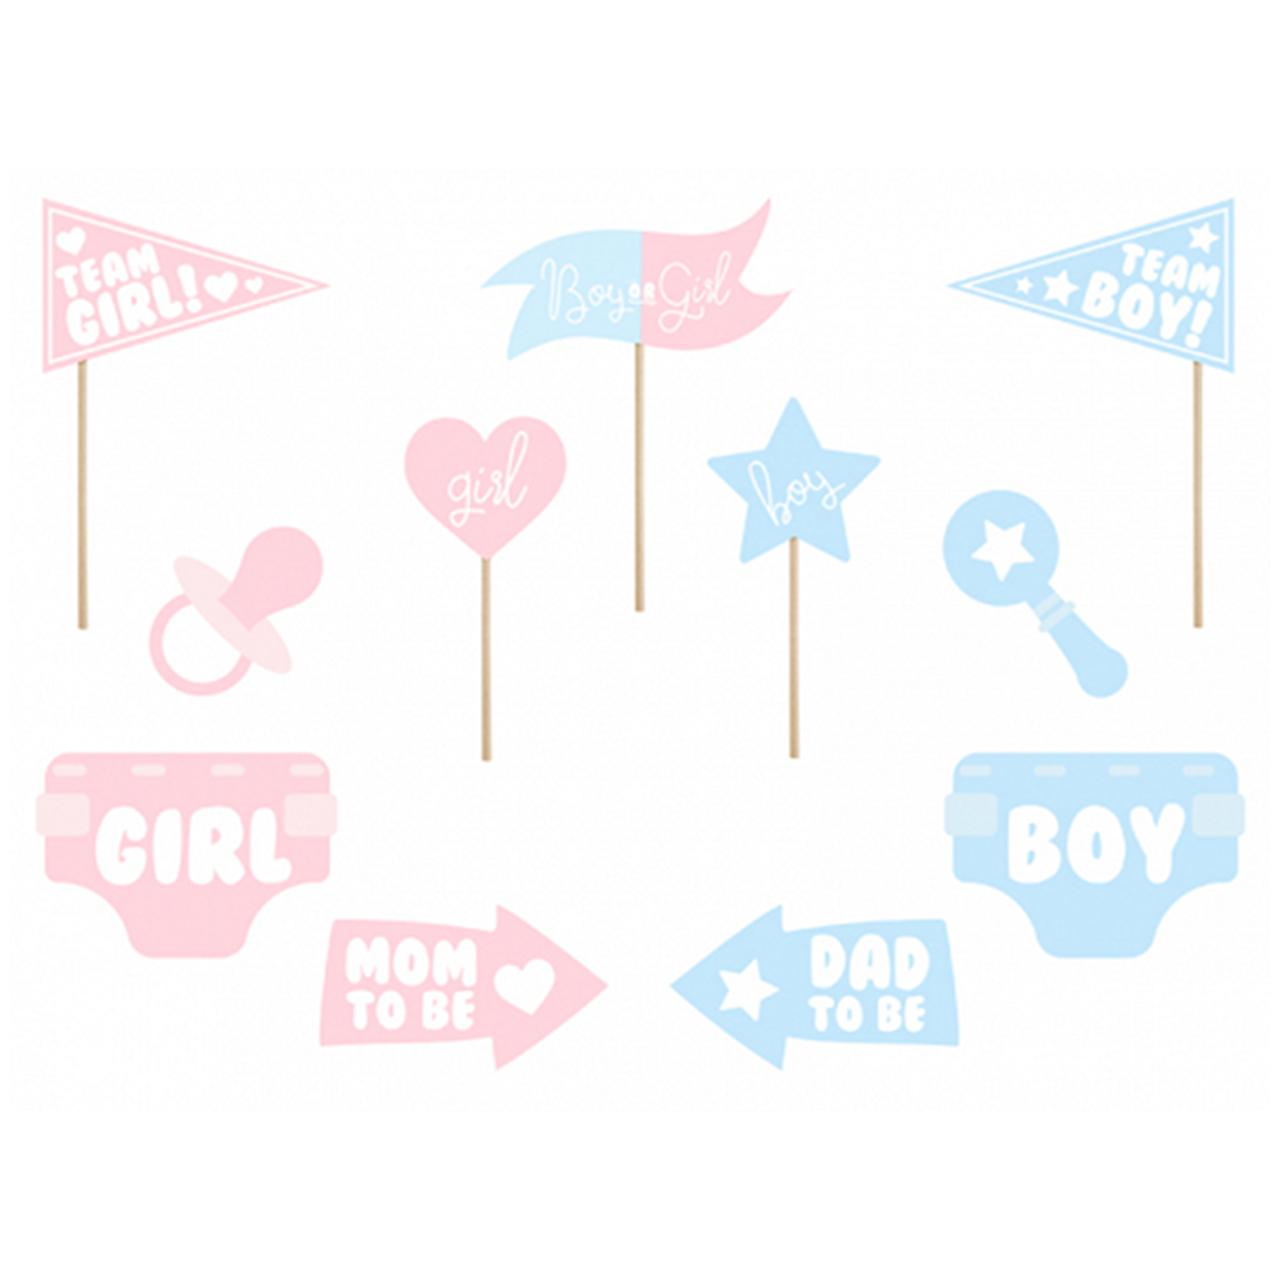 1 Photobooth Set - Boy or Girl